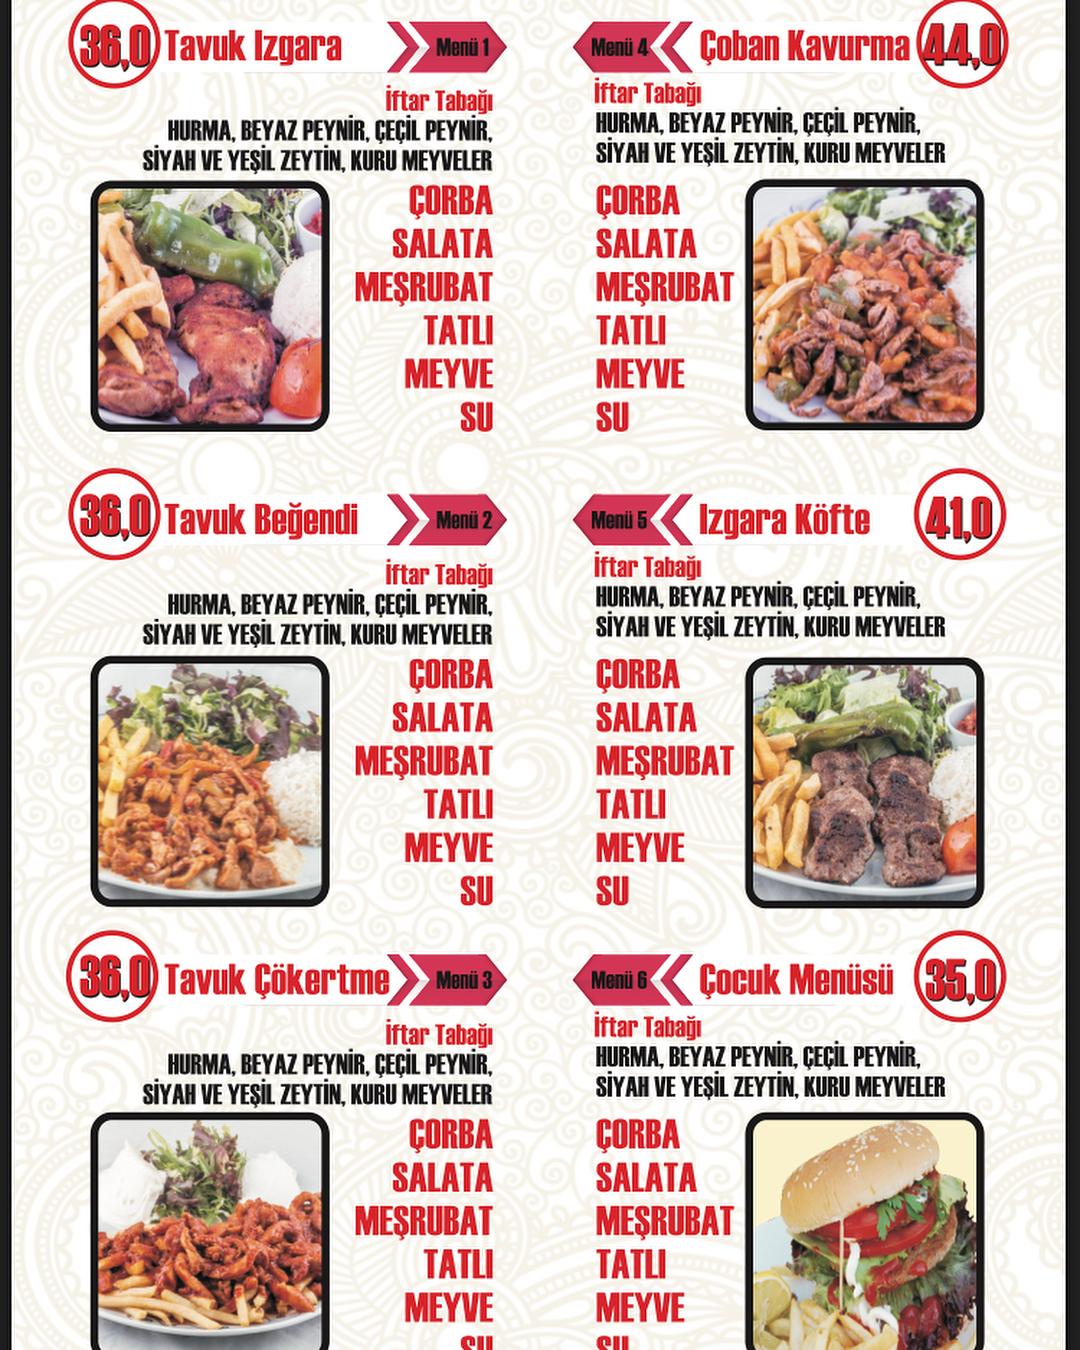 bahçem kafe hamamönü ankara iftar menu